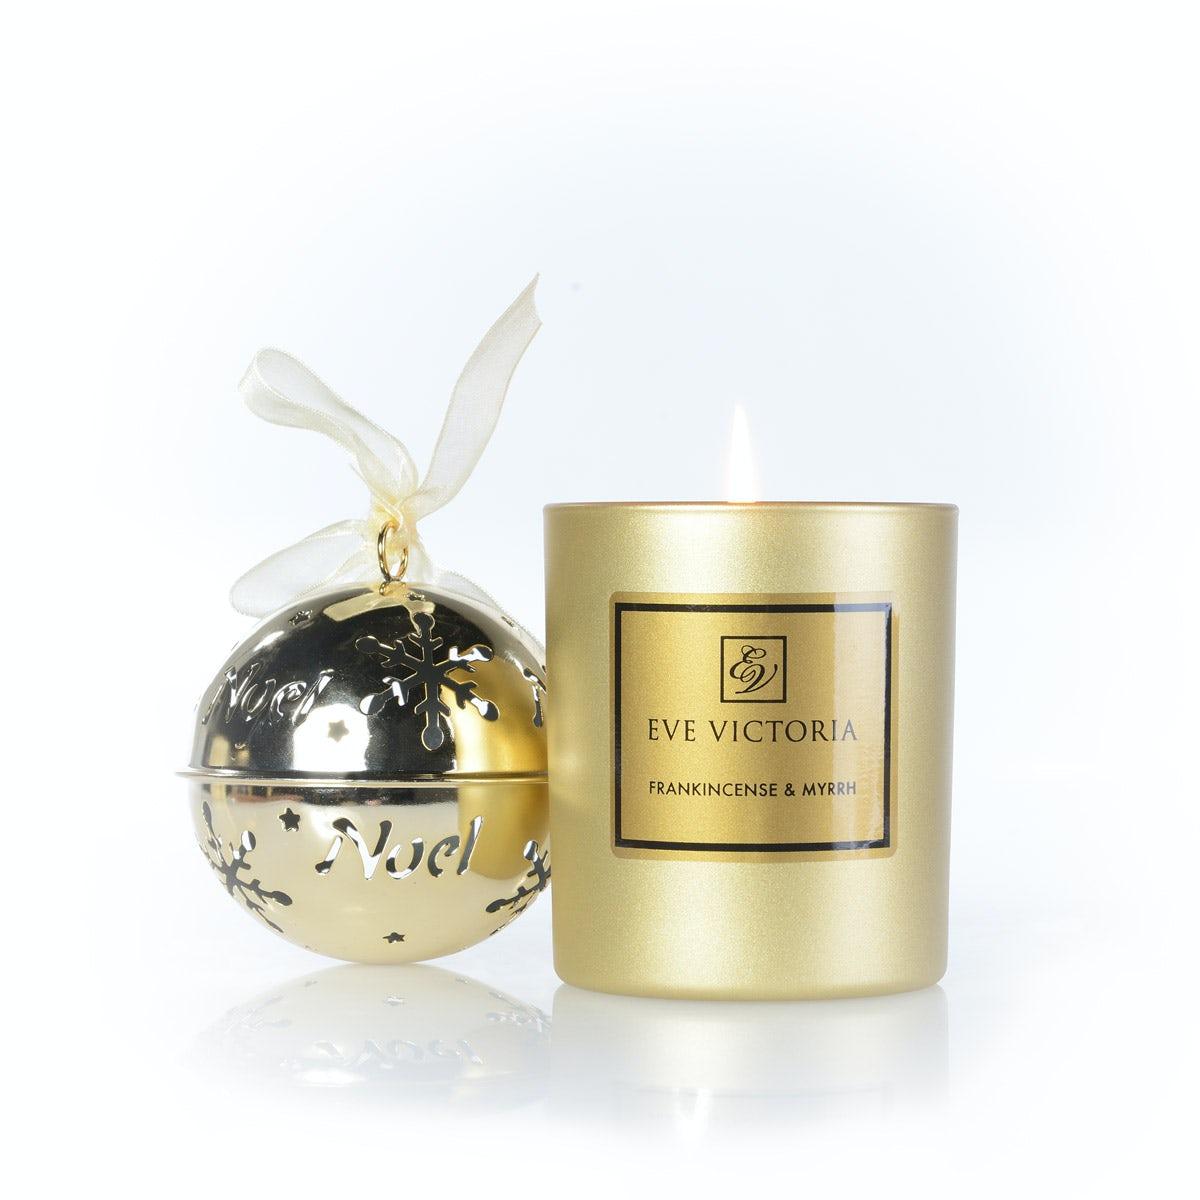 Eve Victoria Frankincense & myrrh large candle 30cl